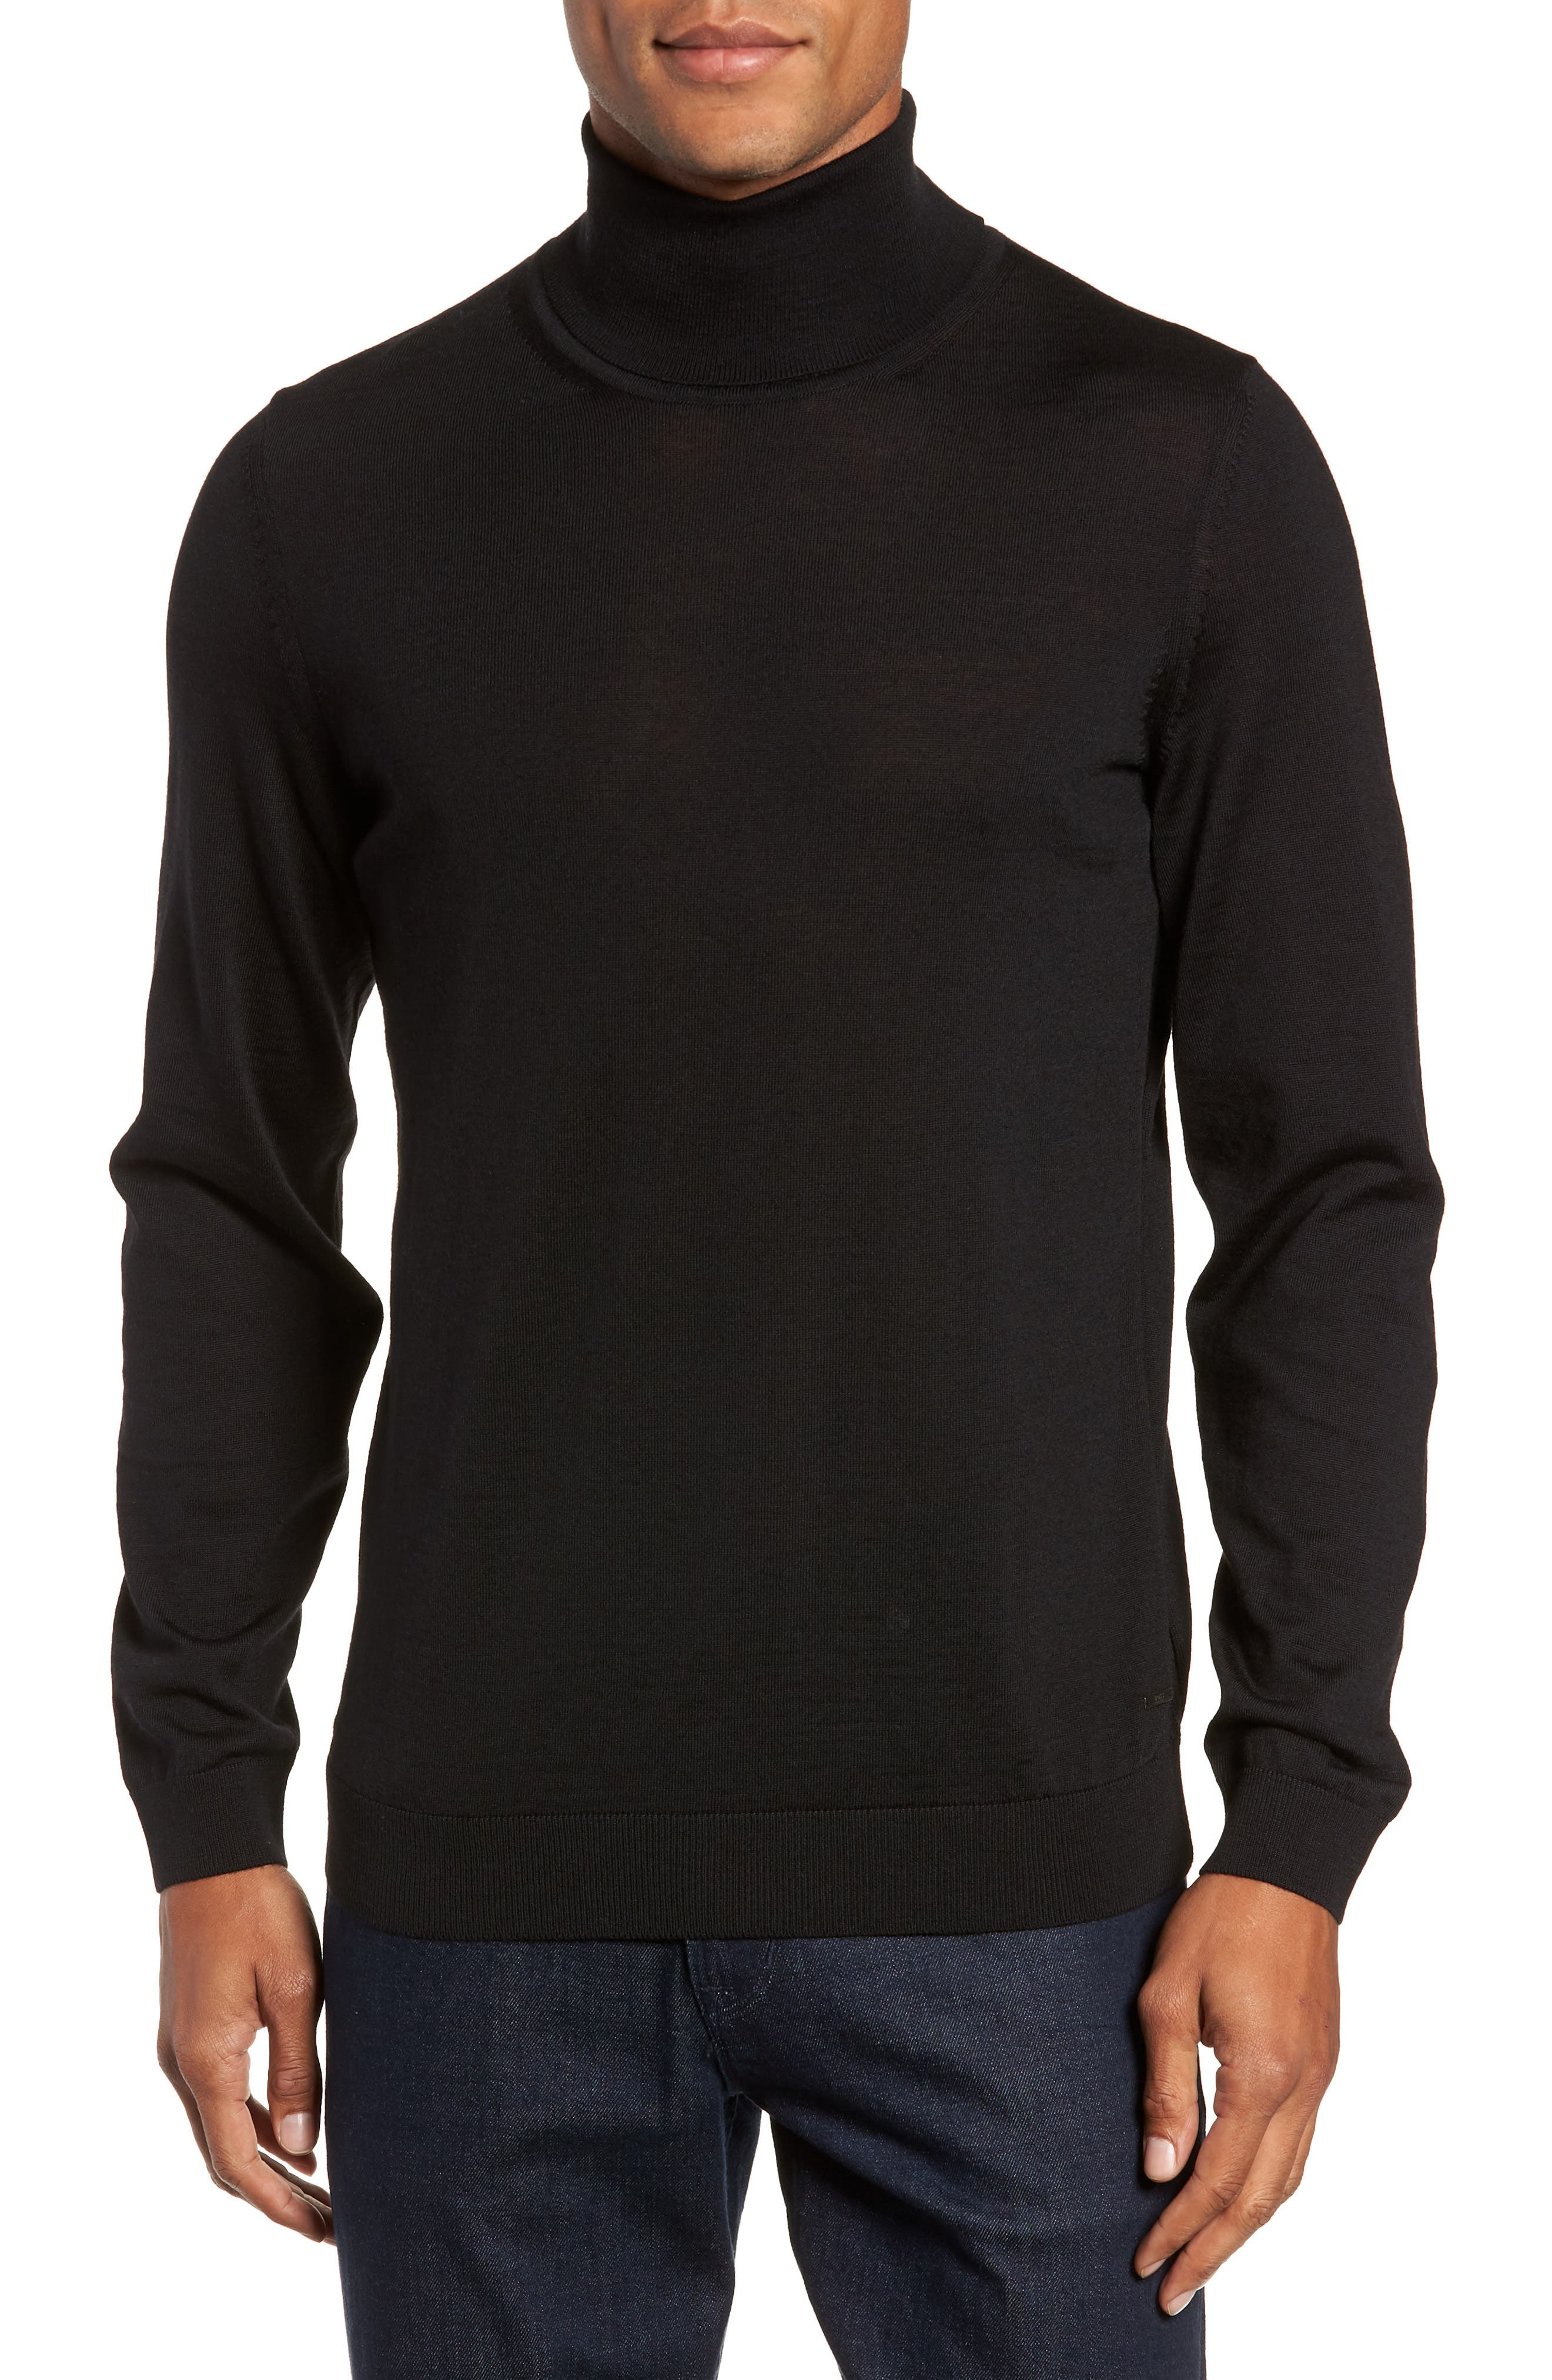 Musso Slim Fit Wool Turtleneck Sweater,                             Main thumbnail 1, color,                             BLACK